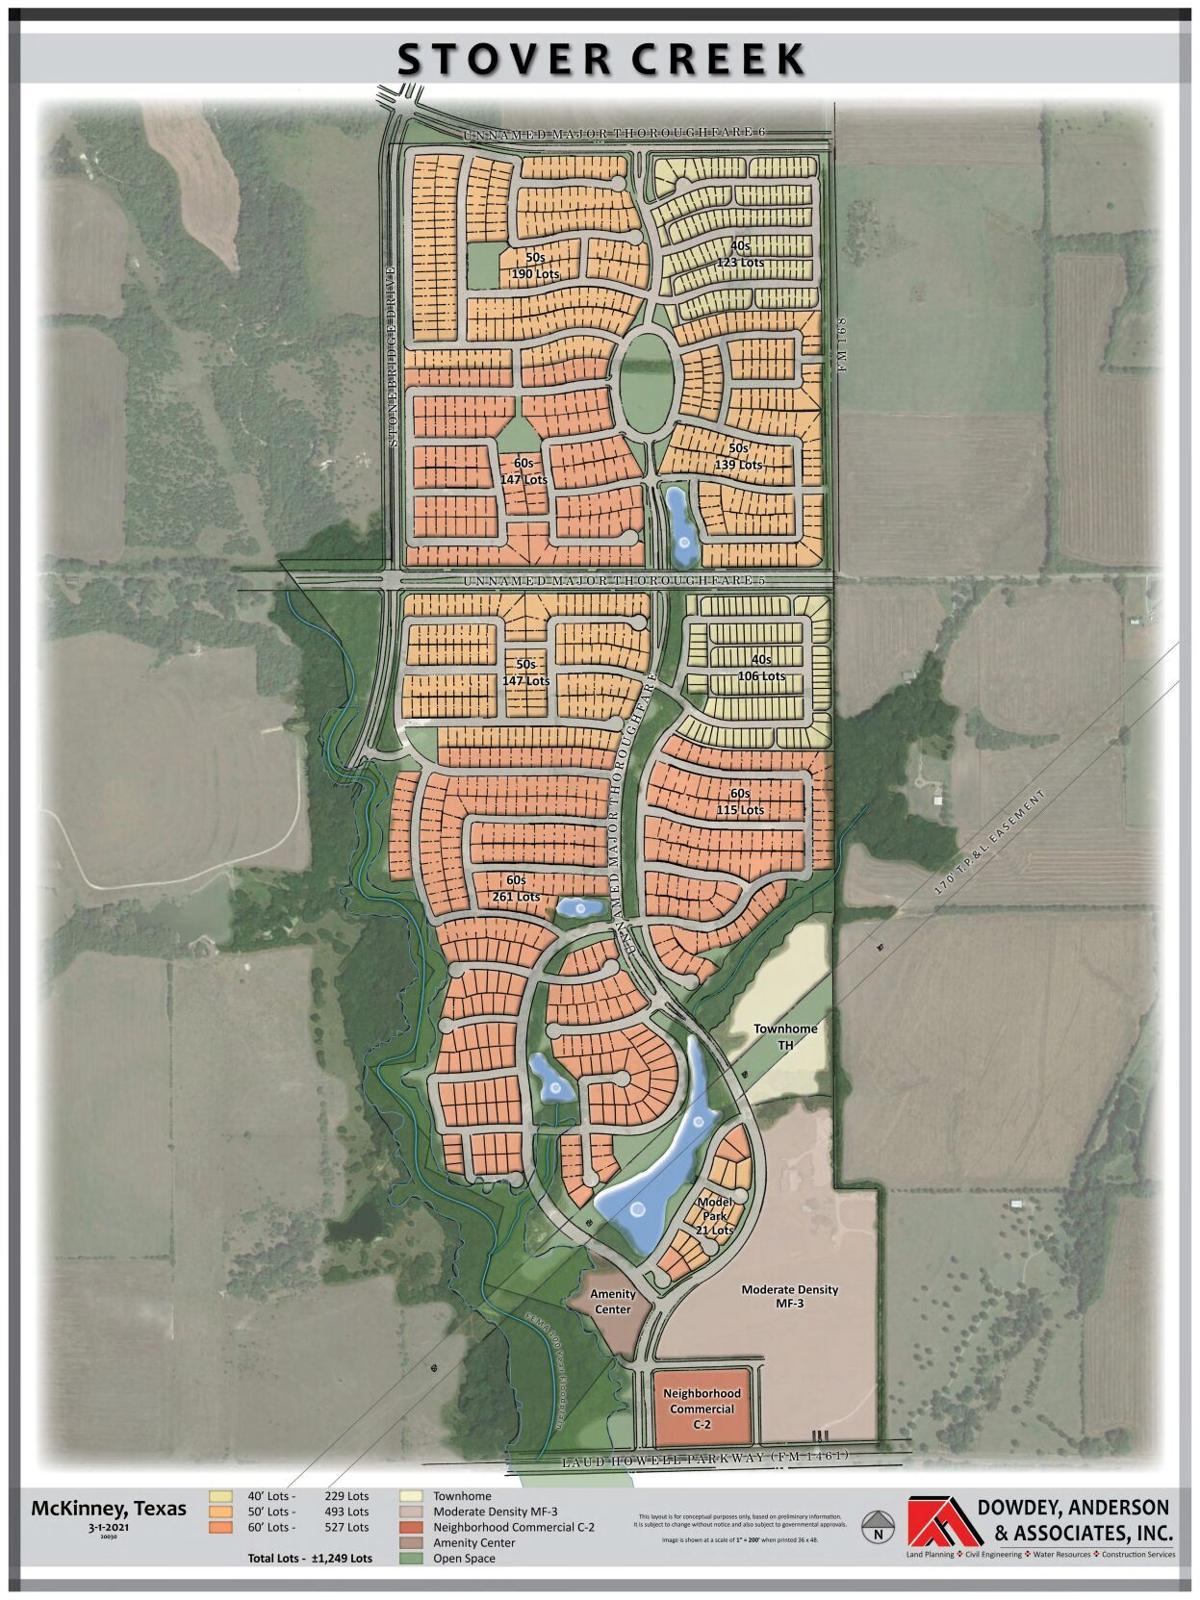 Stover Creek concept plan